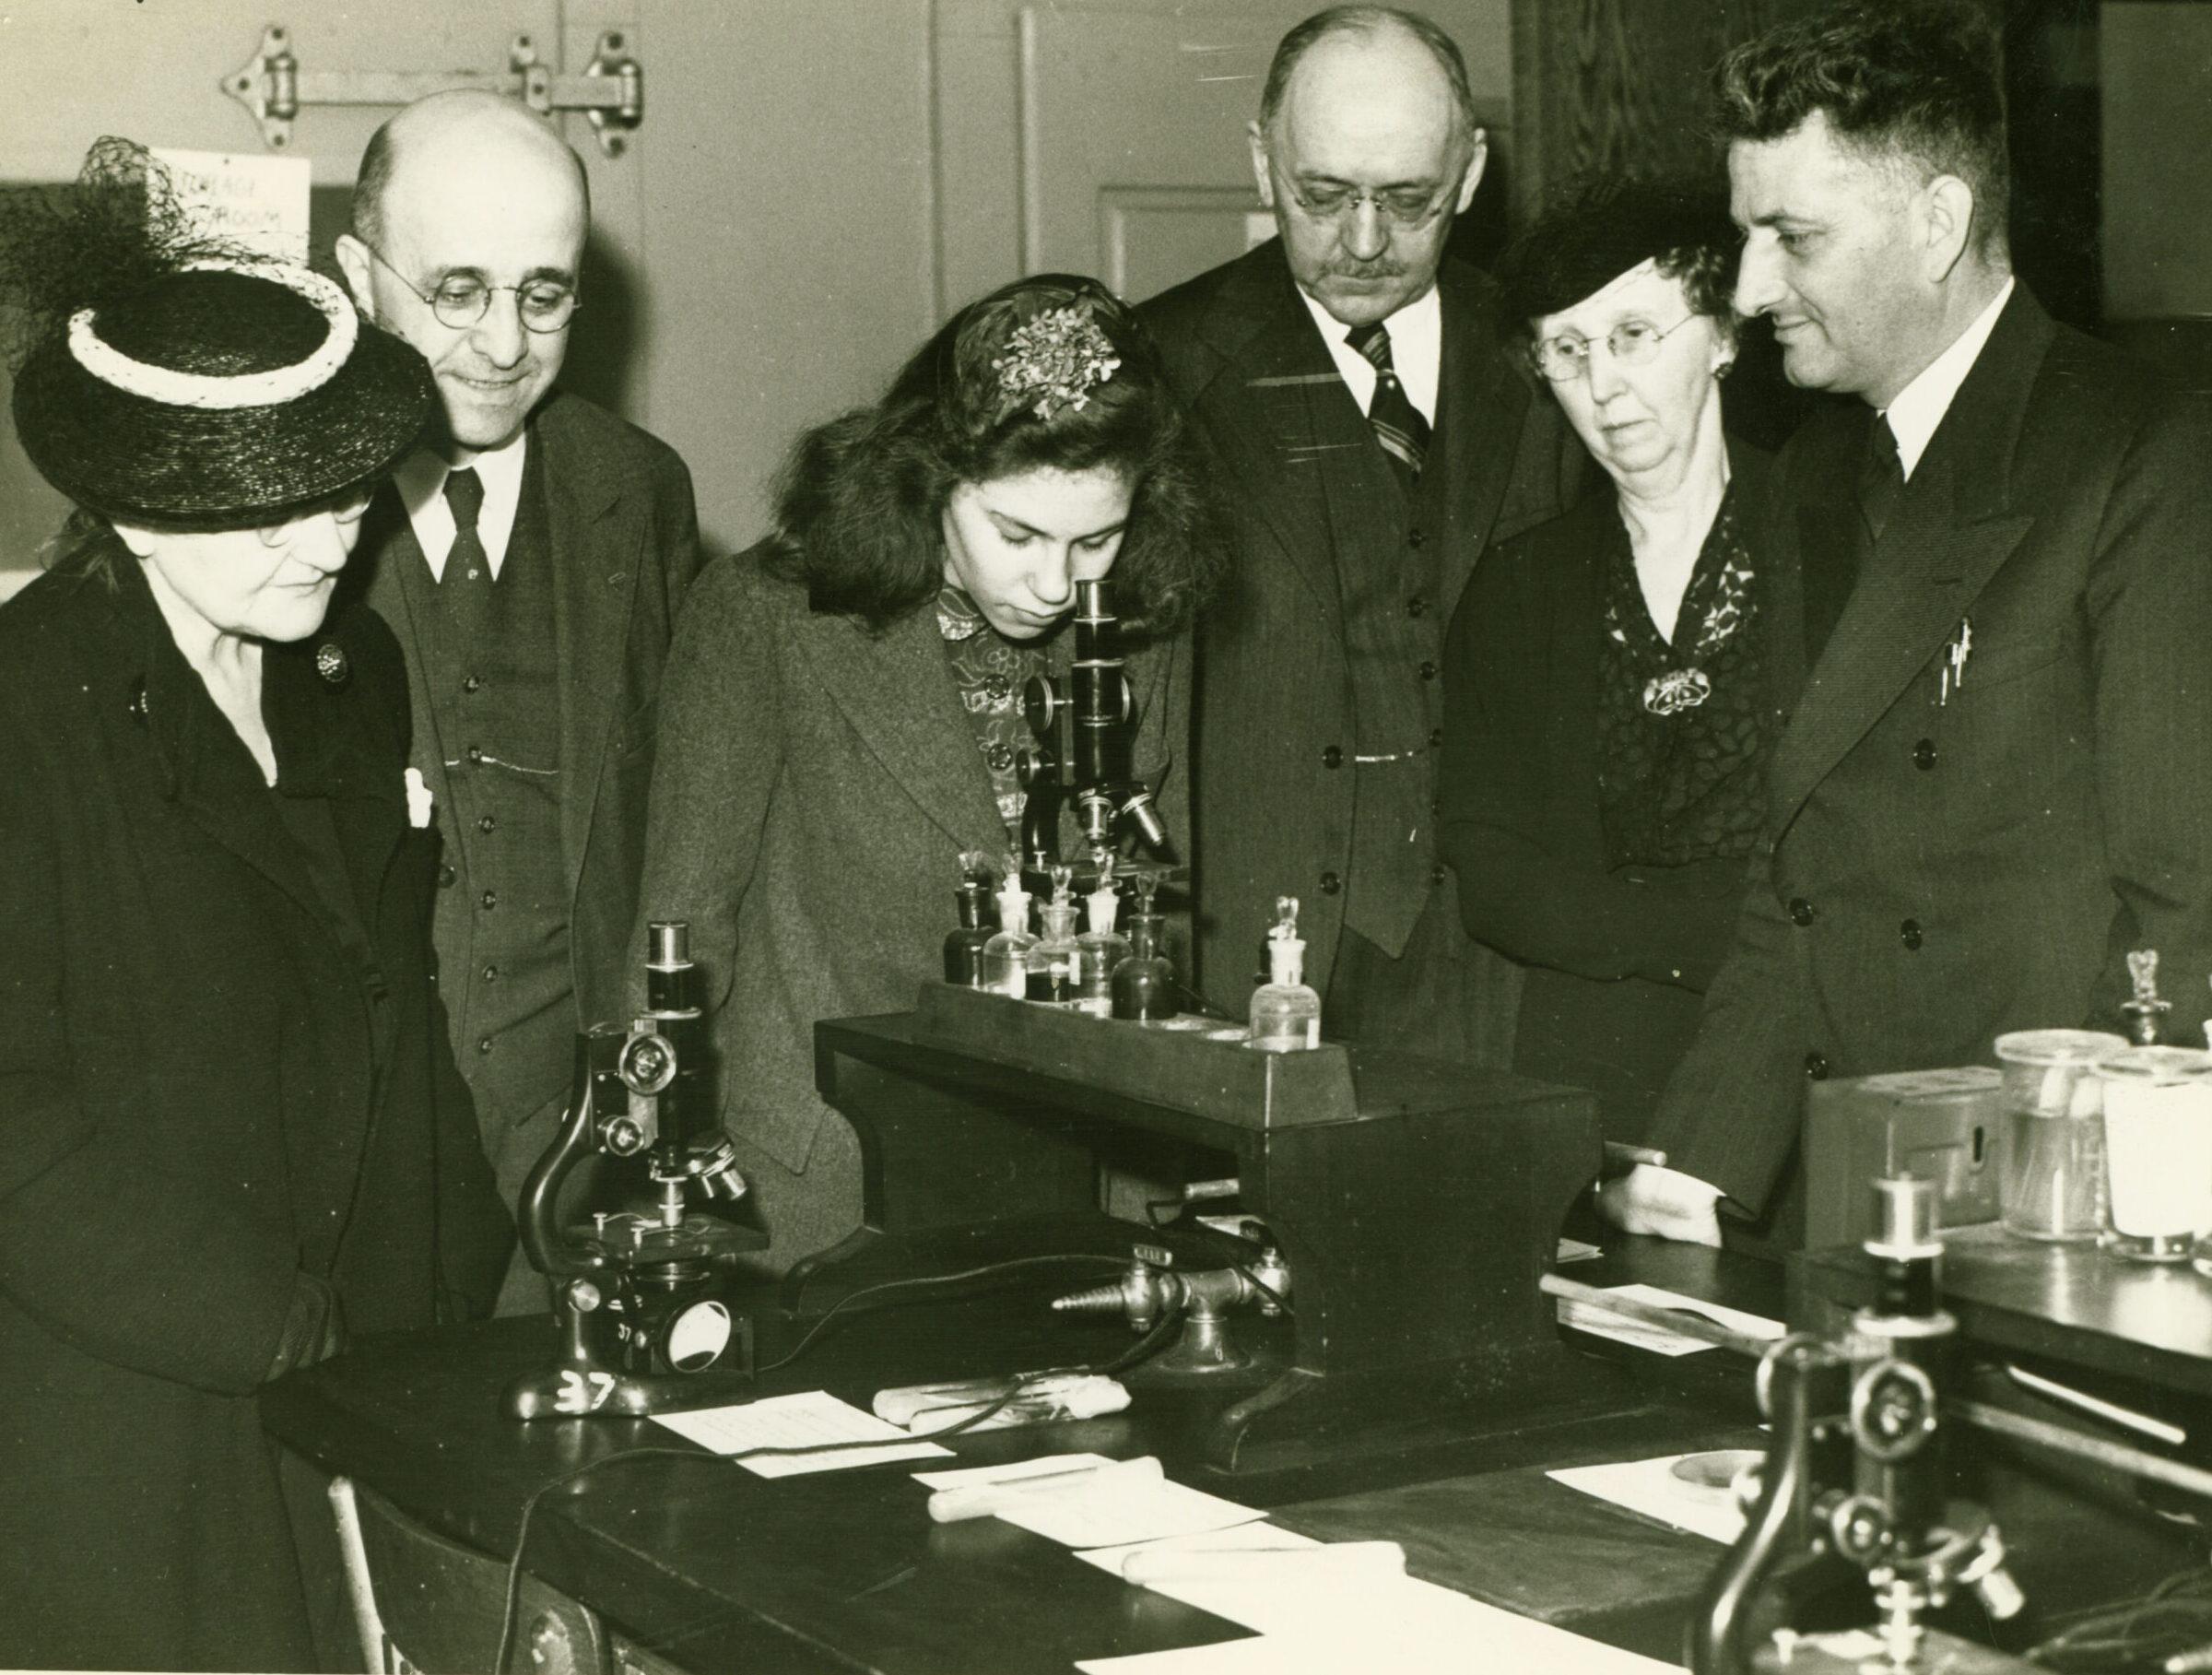 Dr. Shankweiler demonstrates lab equipment to visitors, circa 1935